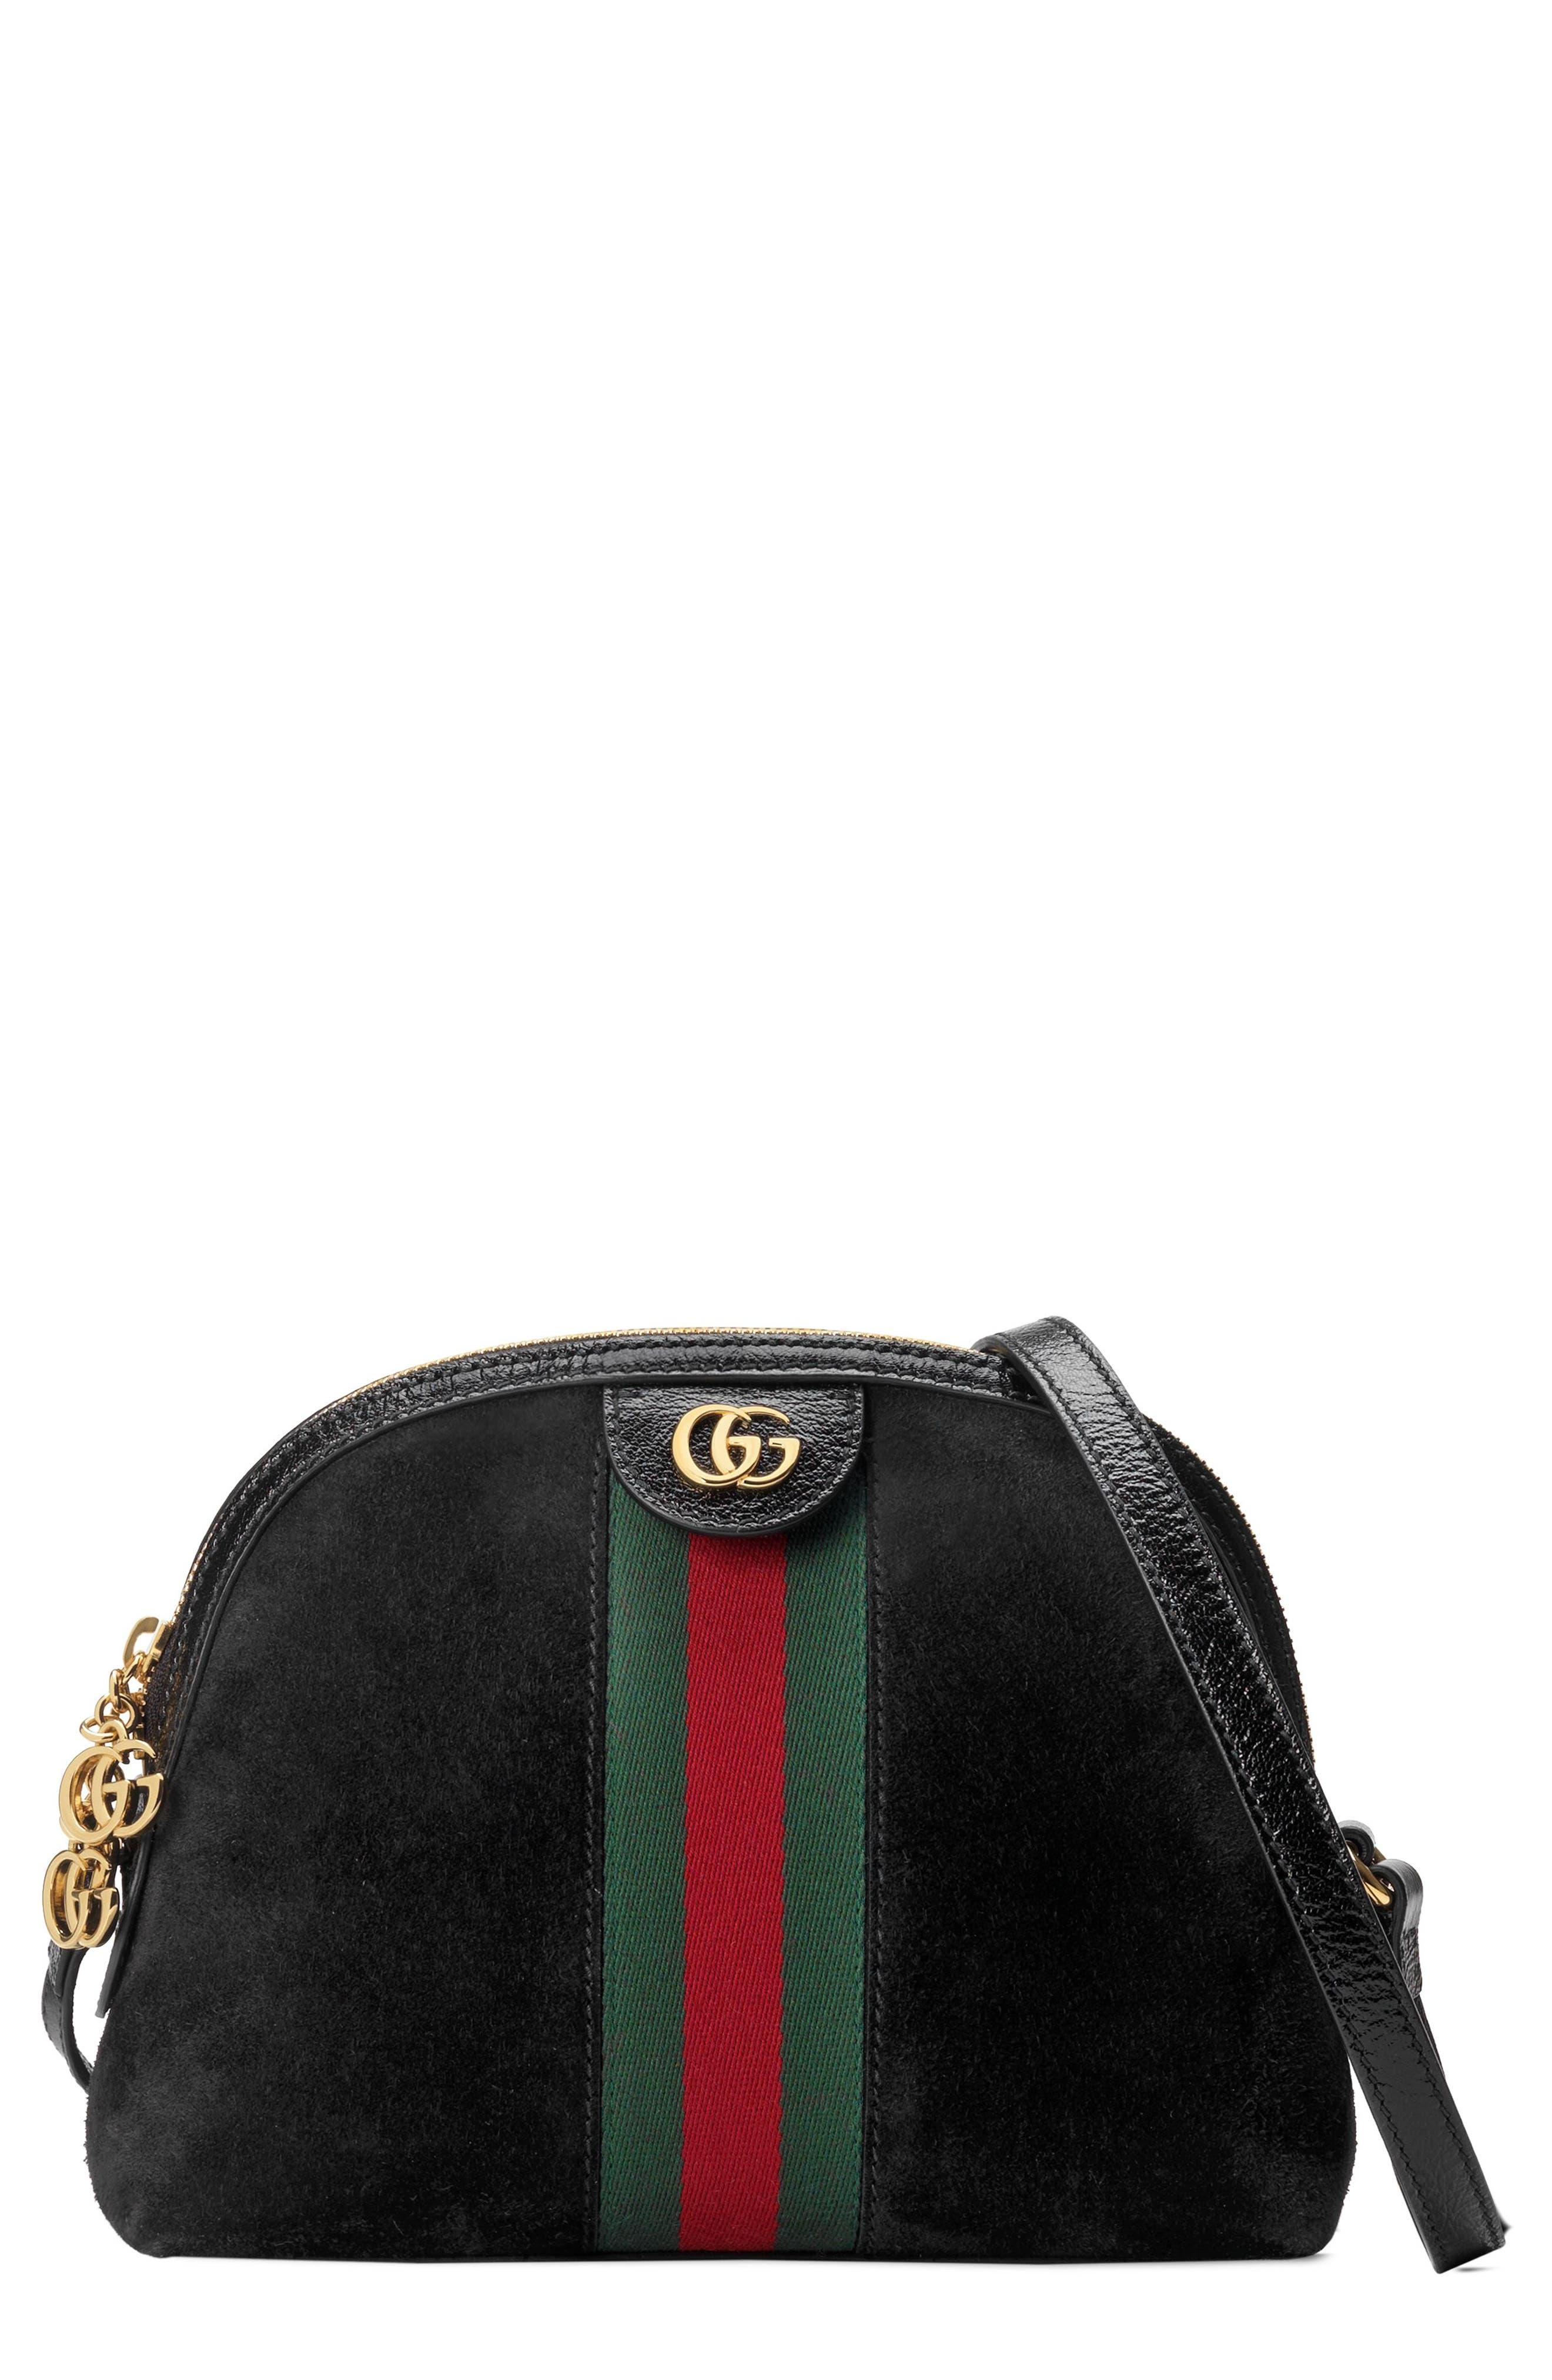 Small Suede Shoulder Bag,                         Main,                         color, NERO/ NERO/ VERT RED VERT